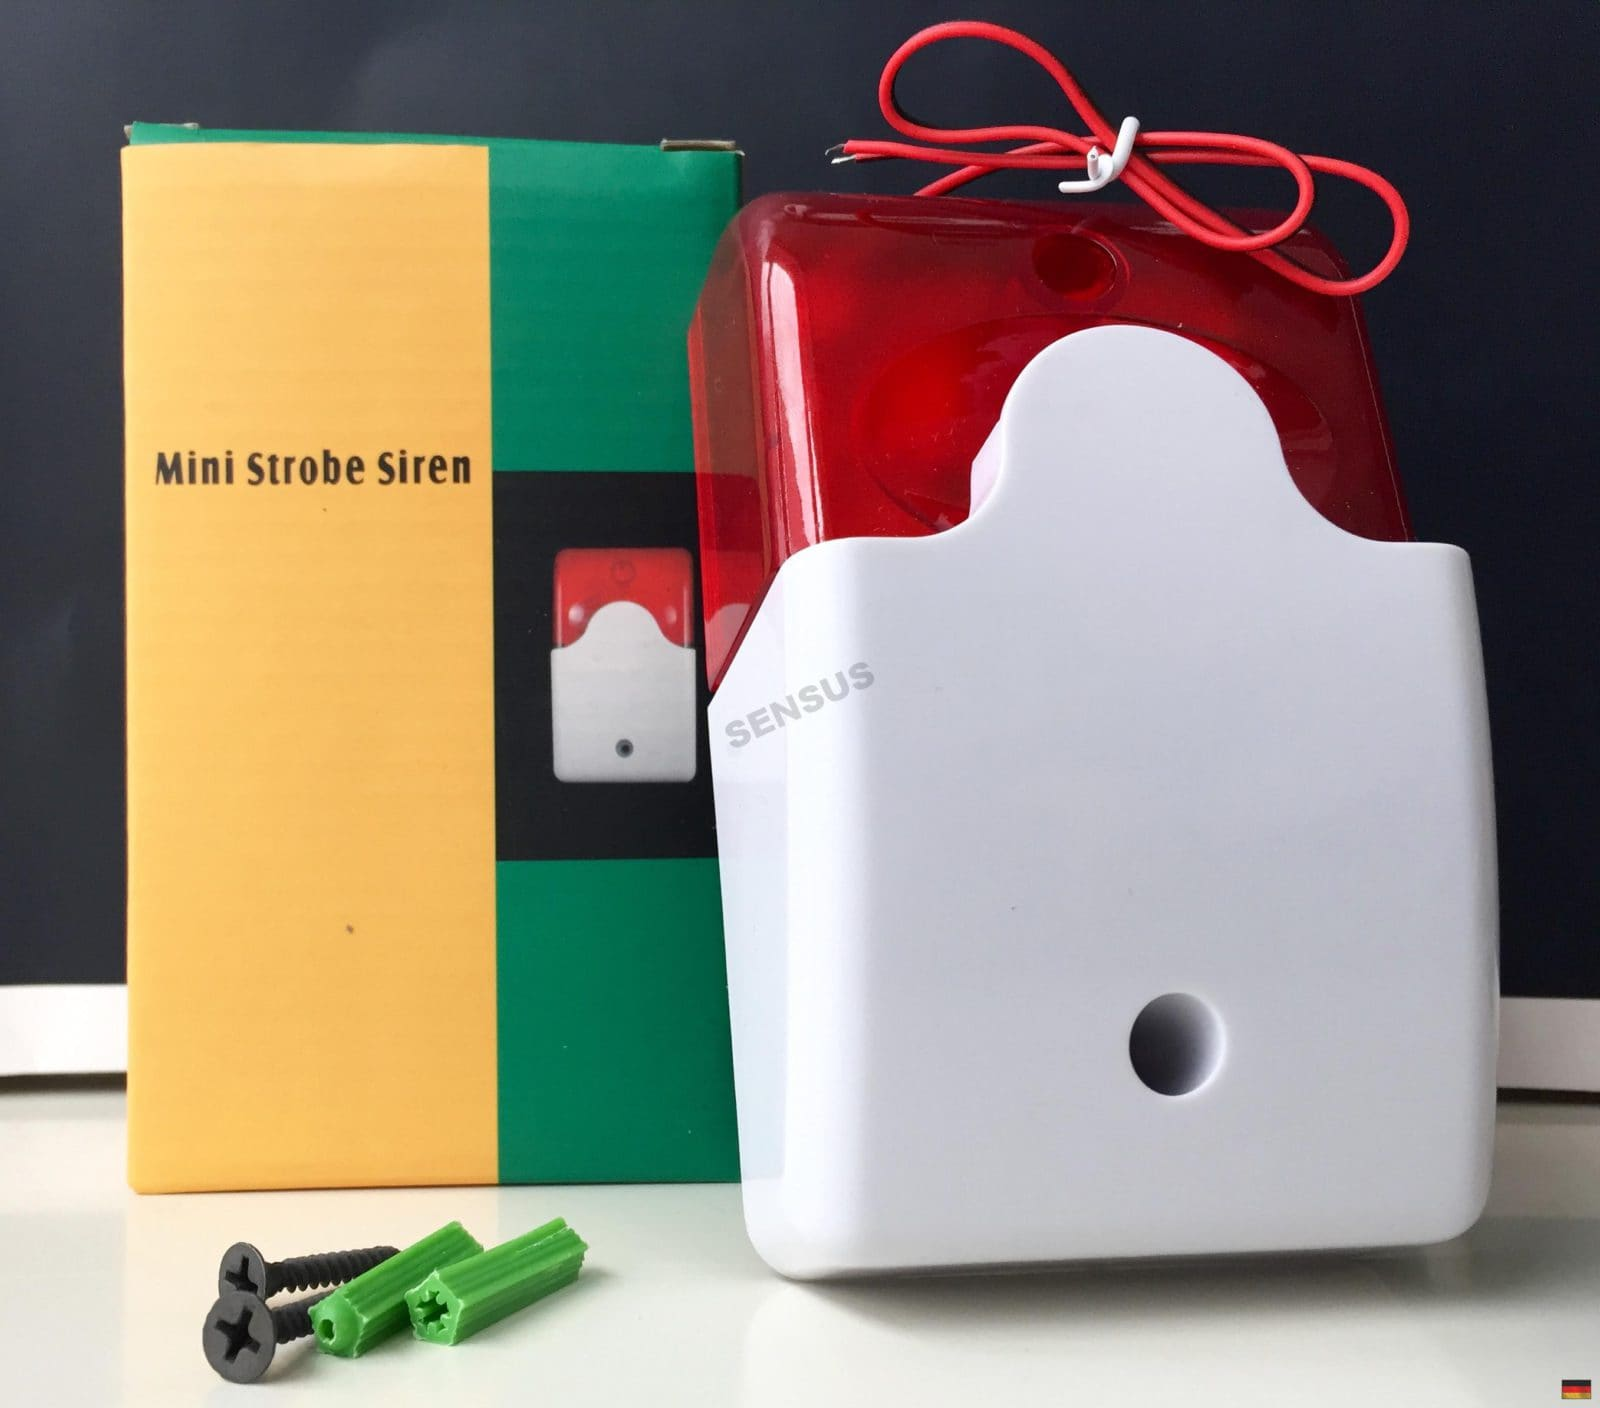 12V Alarmsirene mit Blitzleuchte - Innen Sirene Aussensirene Blitzlicht Alarm Signalgeber